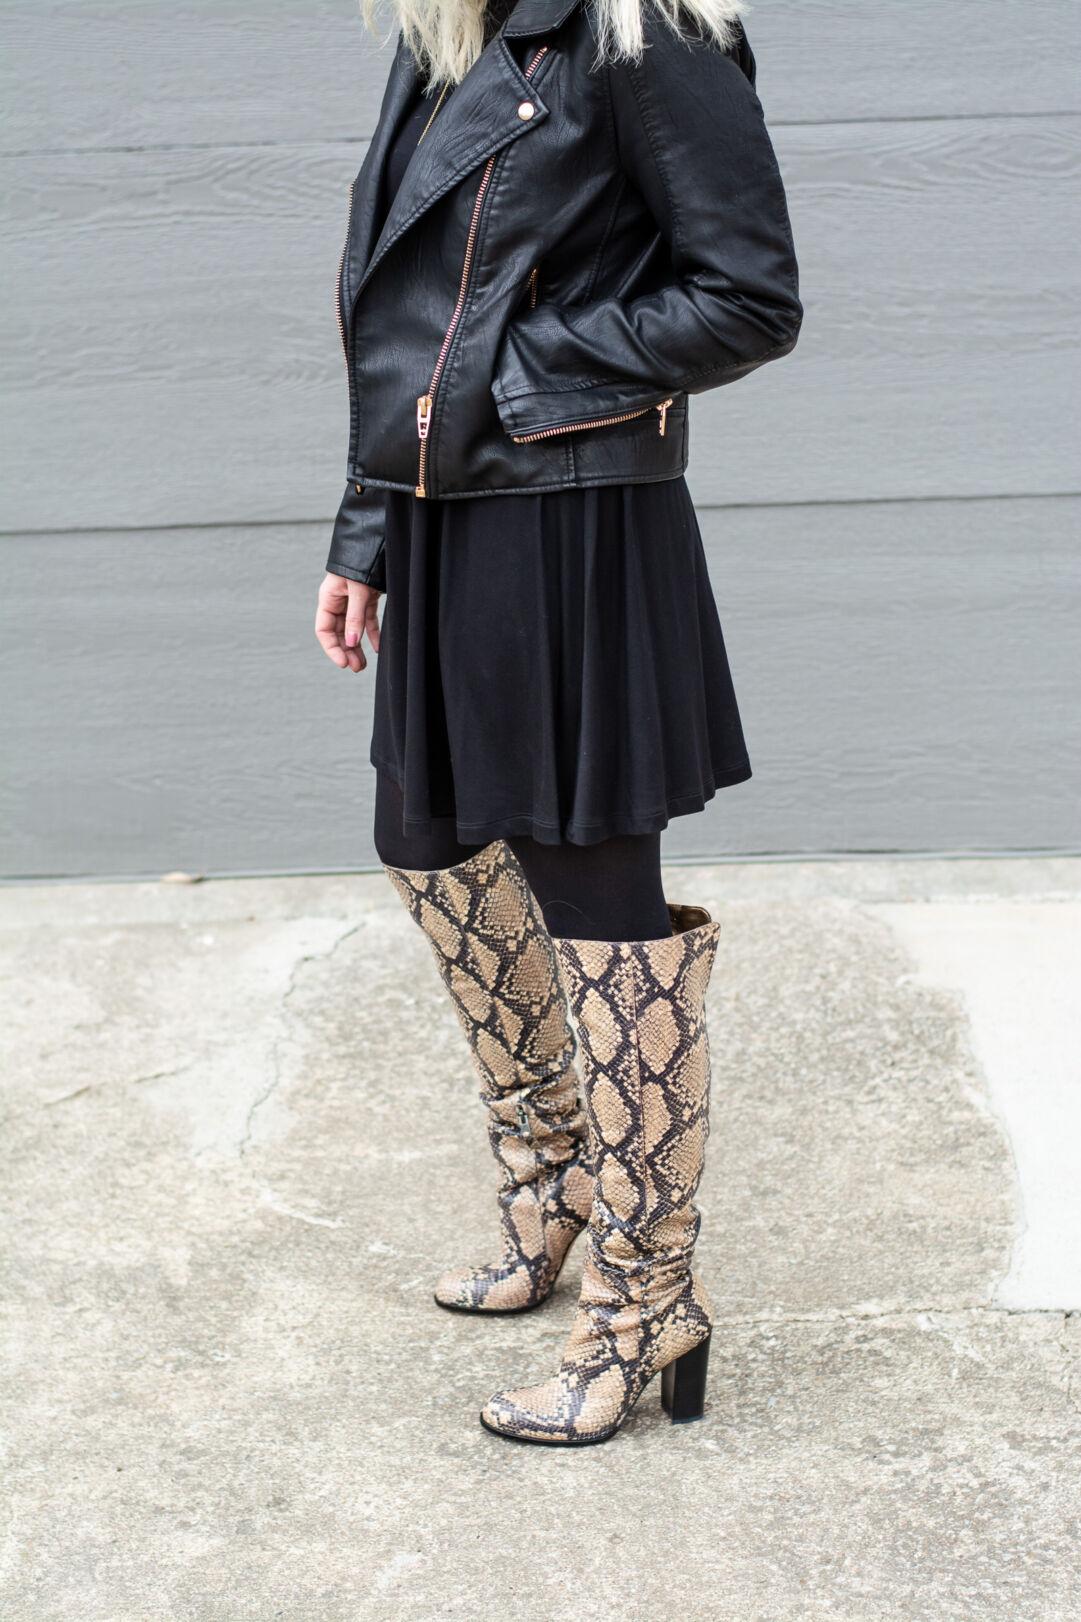 abfc95585d6 Black Moto Jacket + Snakeskin Boots.